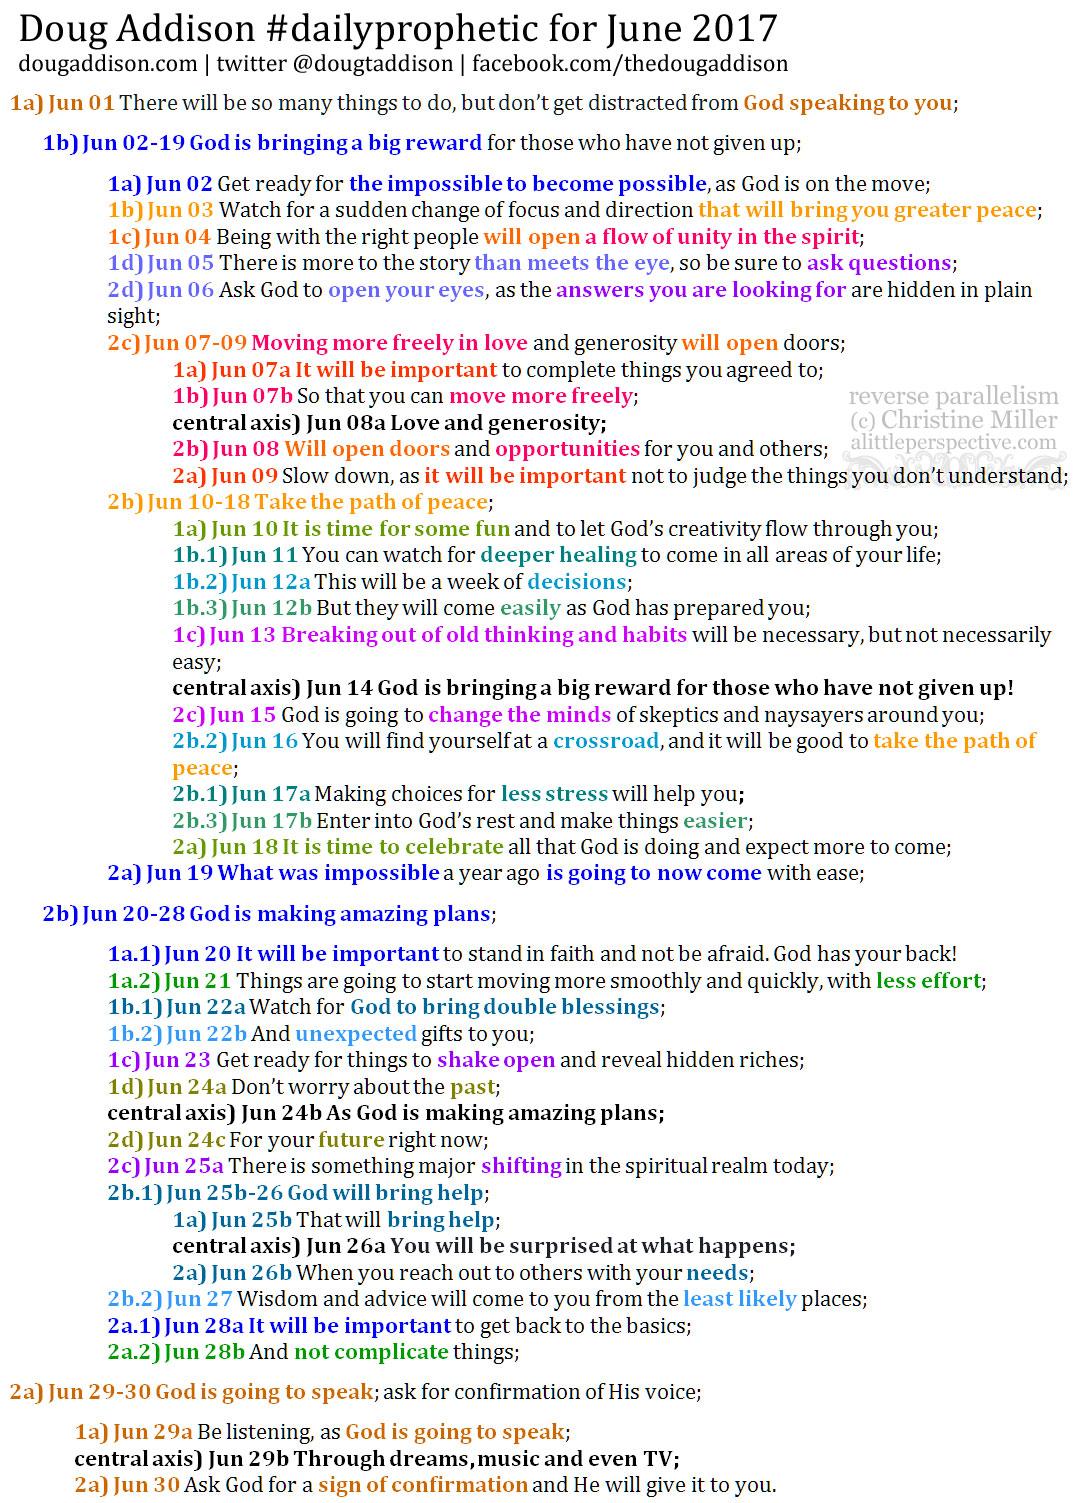 june 2017 daily prophetic chiasm | hebraic life at alittleperspective.com